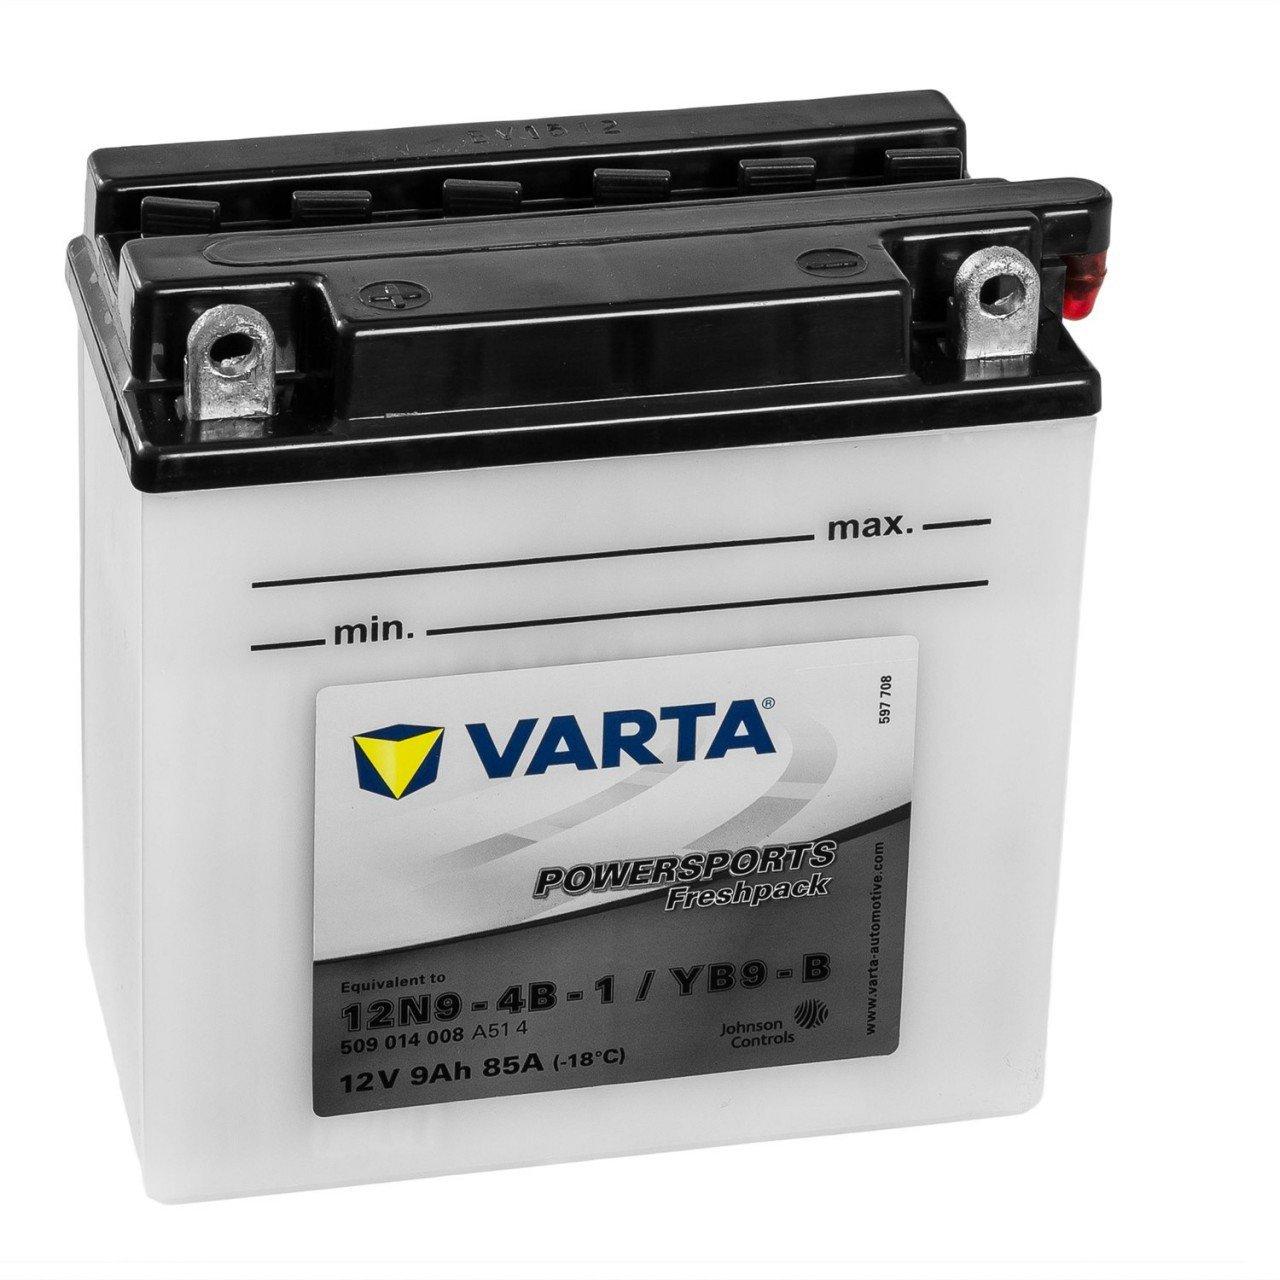 S/äurepack WET Starterbatterie in Erstausr/üsterqualit/ät leistungsstark Accurat Motorrad-Batterie YB9L-B 9Ah 100A 12V Standard-Nassbatterie inkl